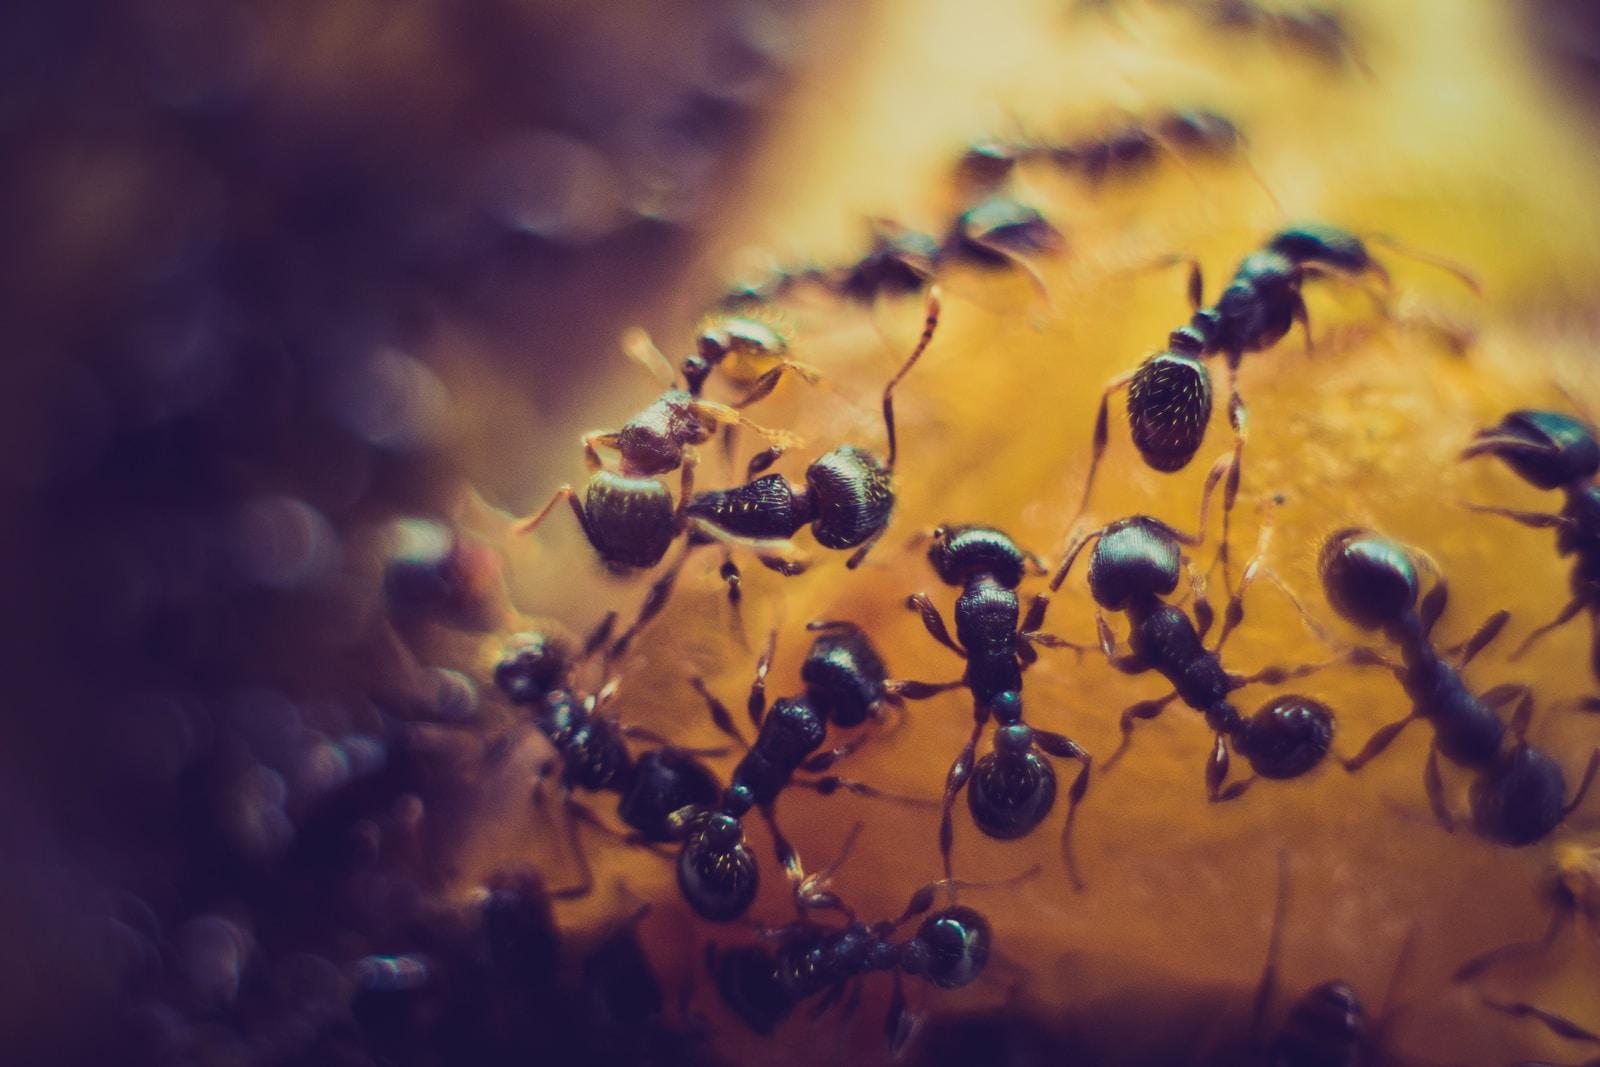 macro photofraphy of black ant